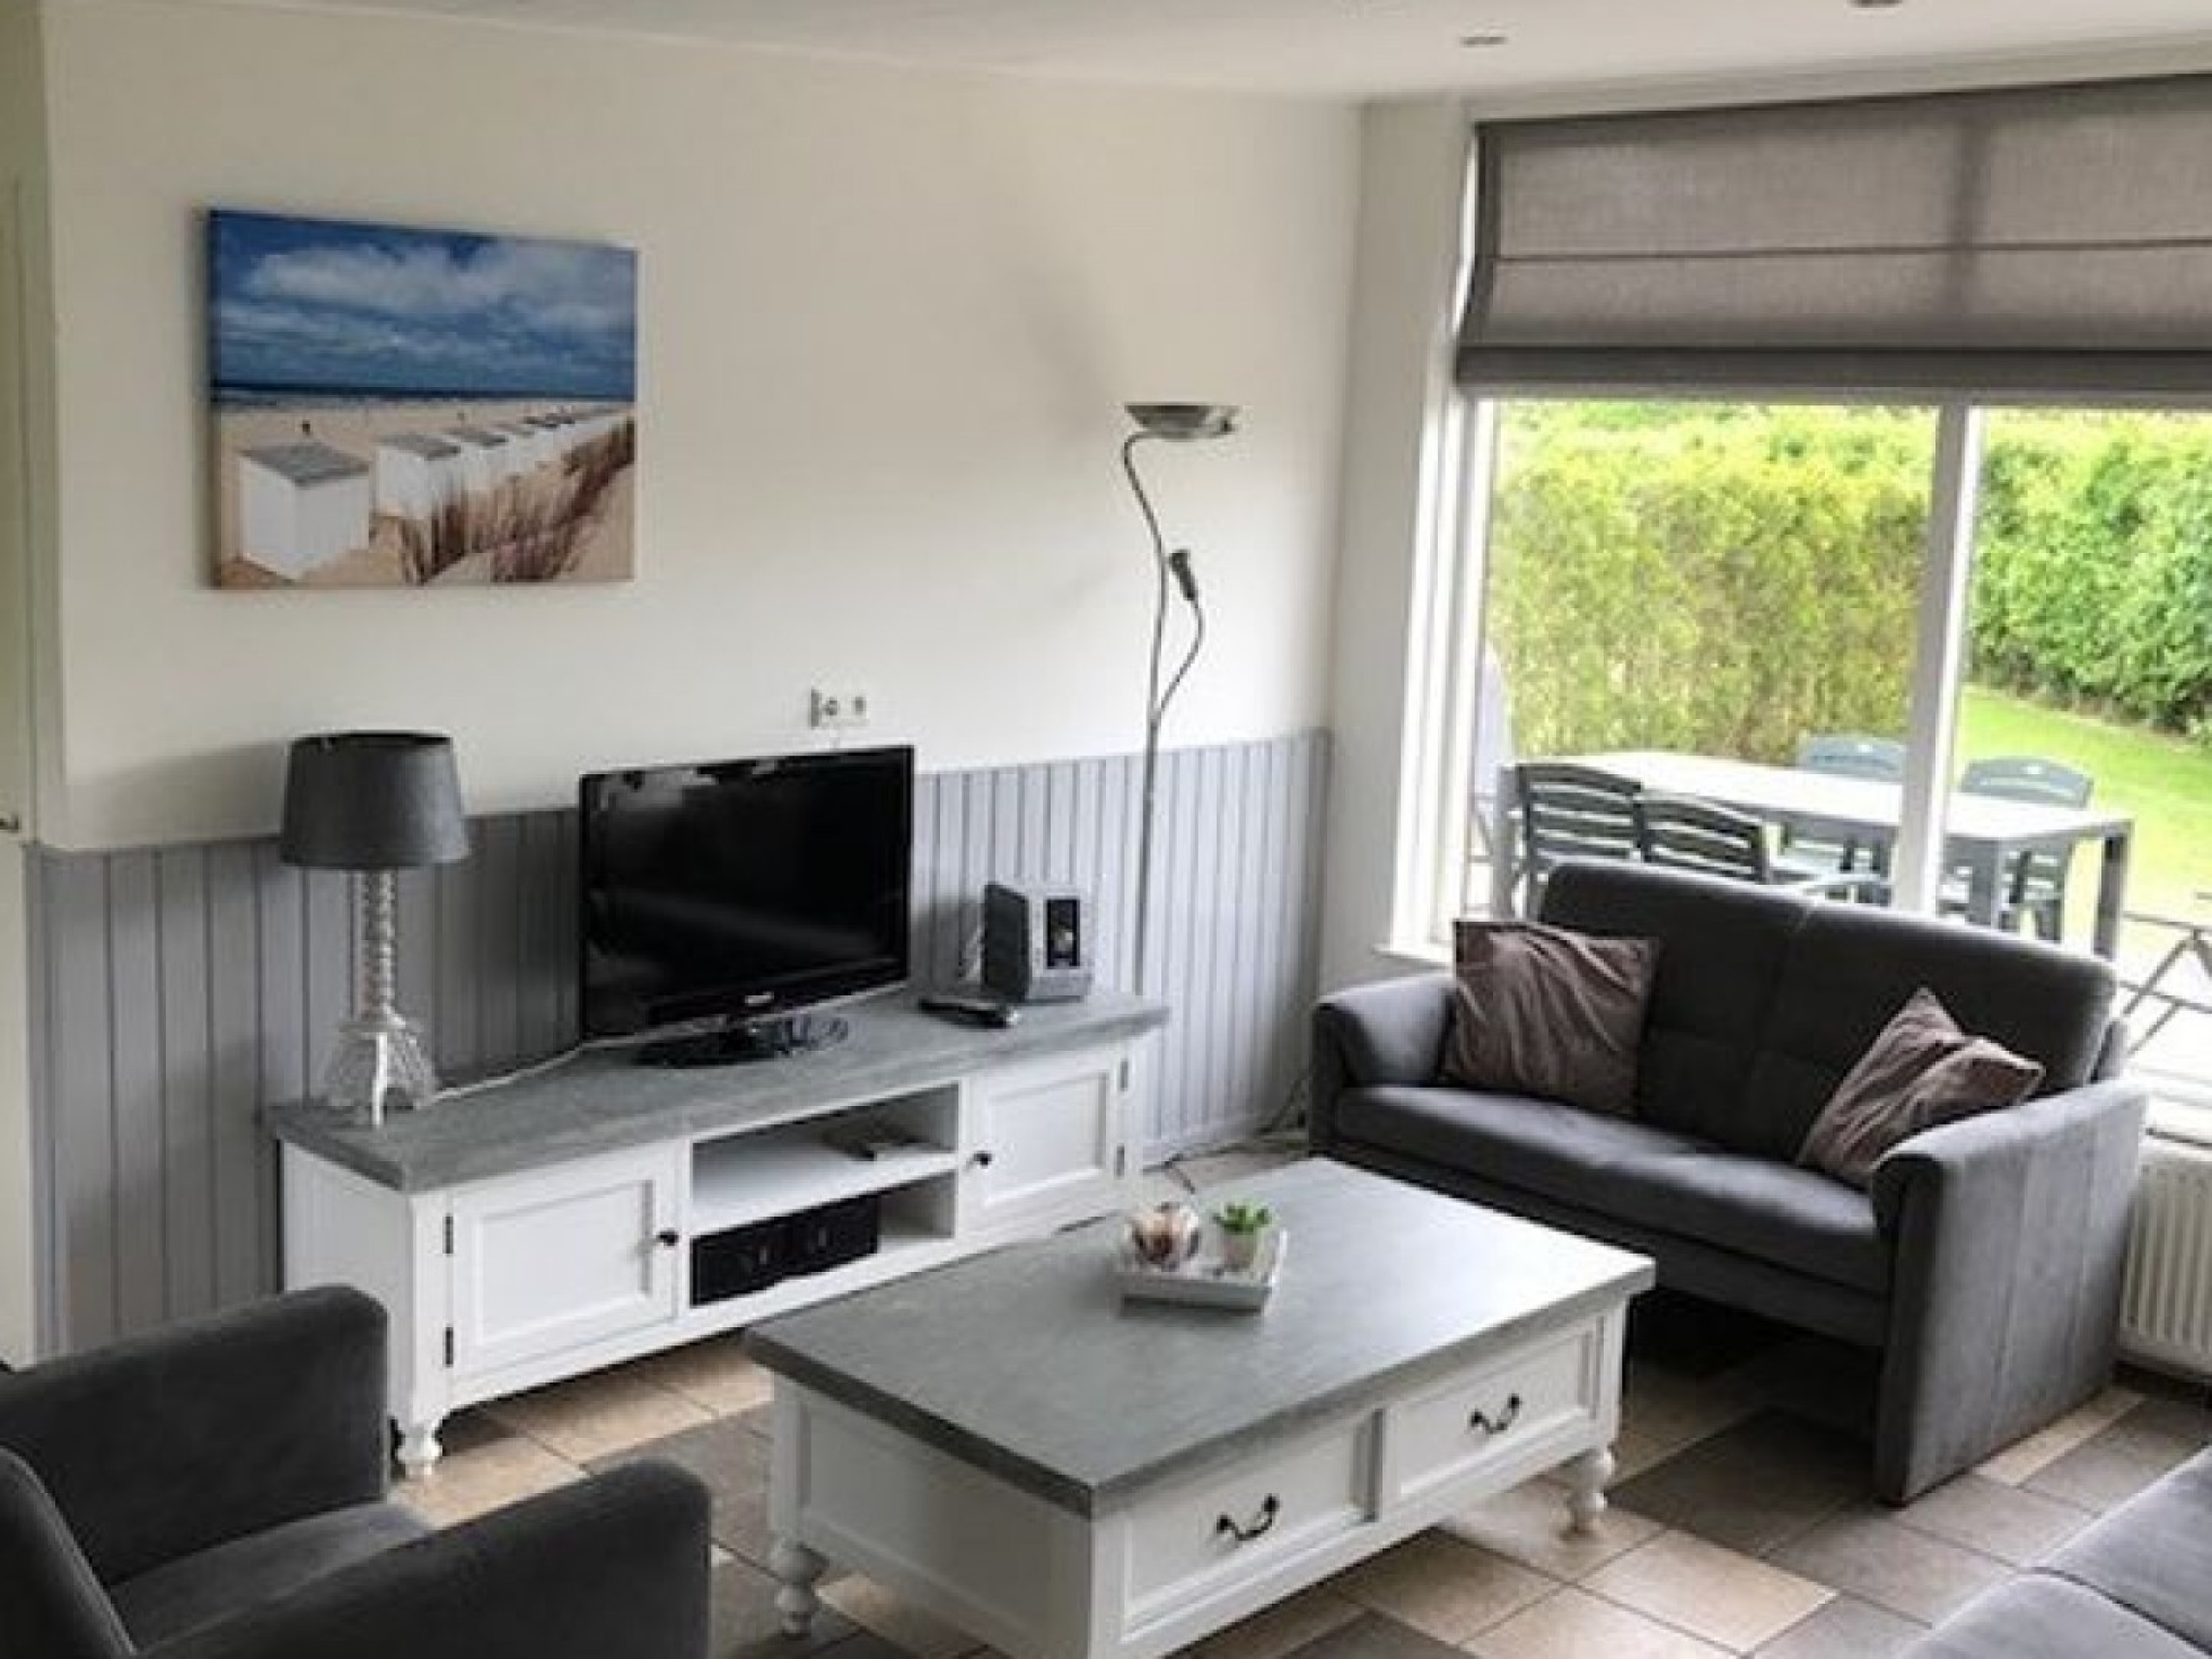 Detached holiday home near De Koog, woods and dunes